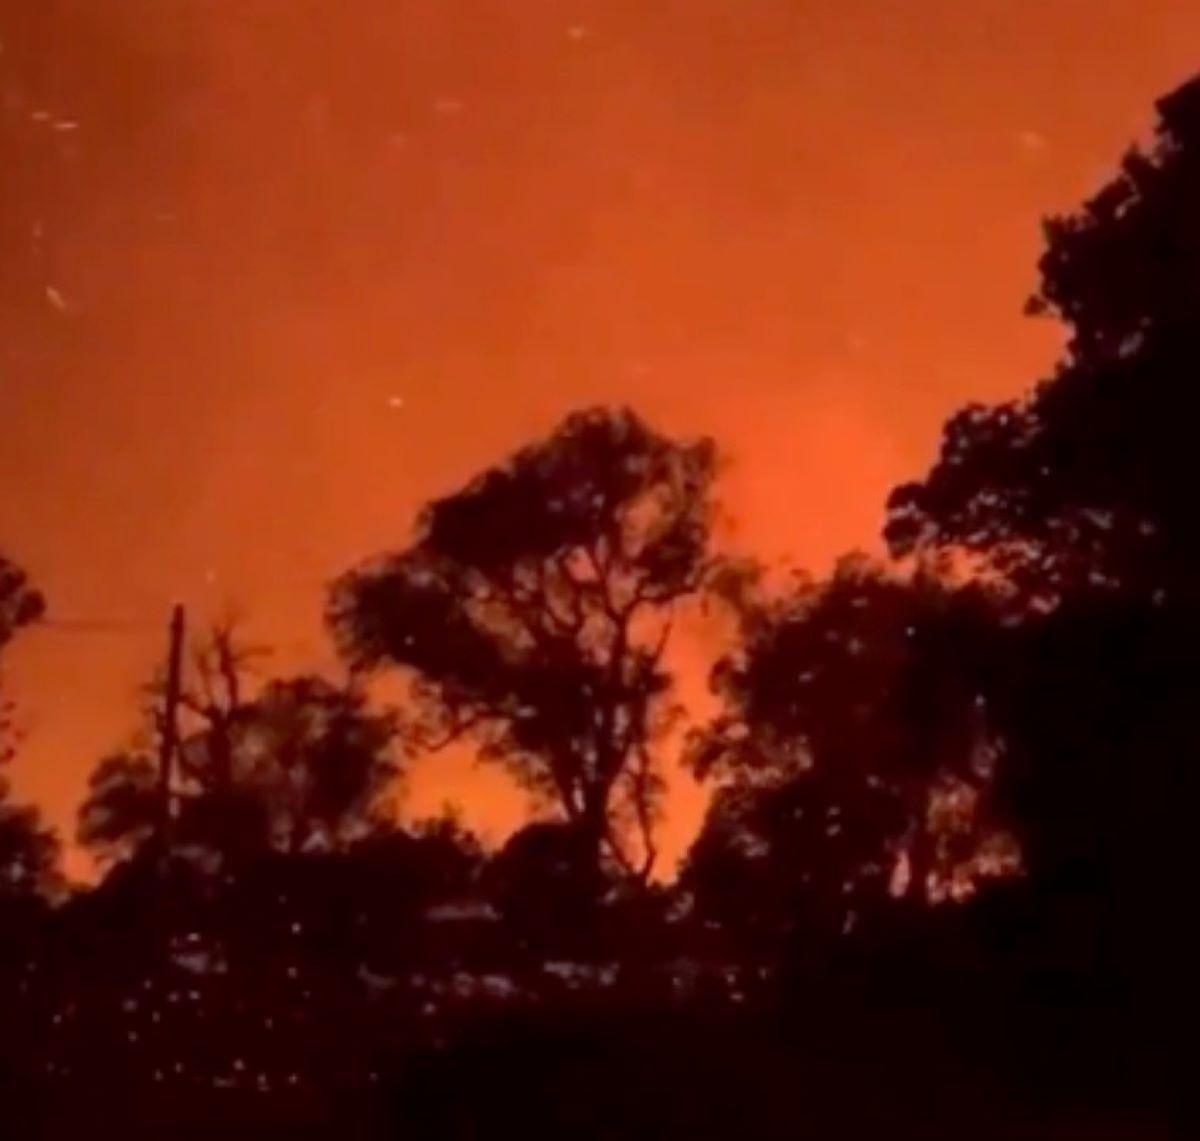 Incendio Saint-Tropez Migliaia Evacuati Migliaia Ettari Fumo